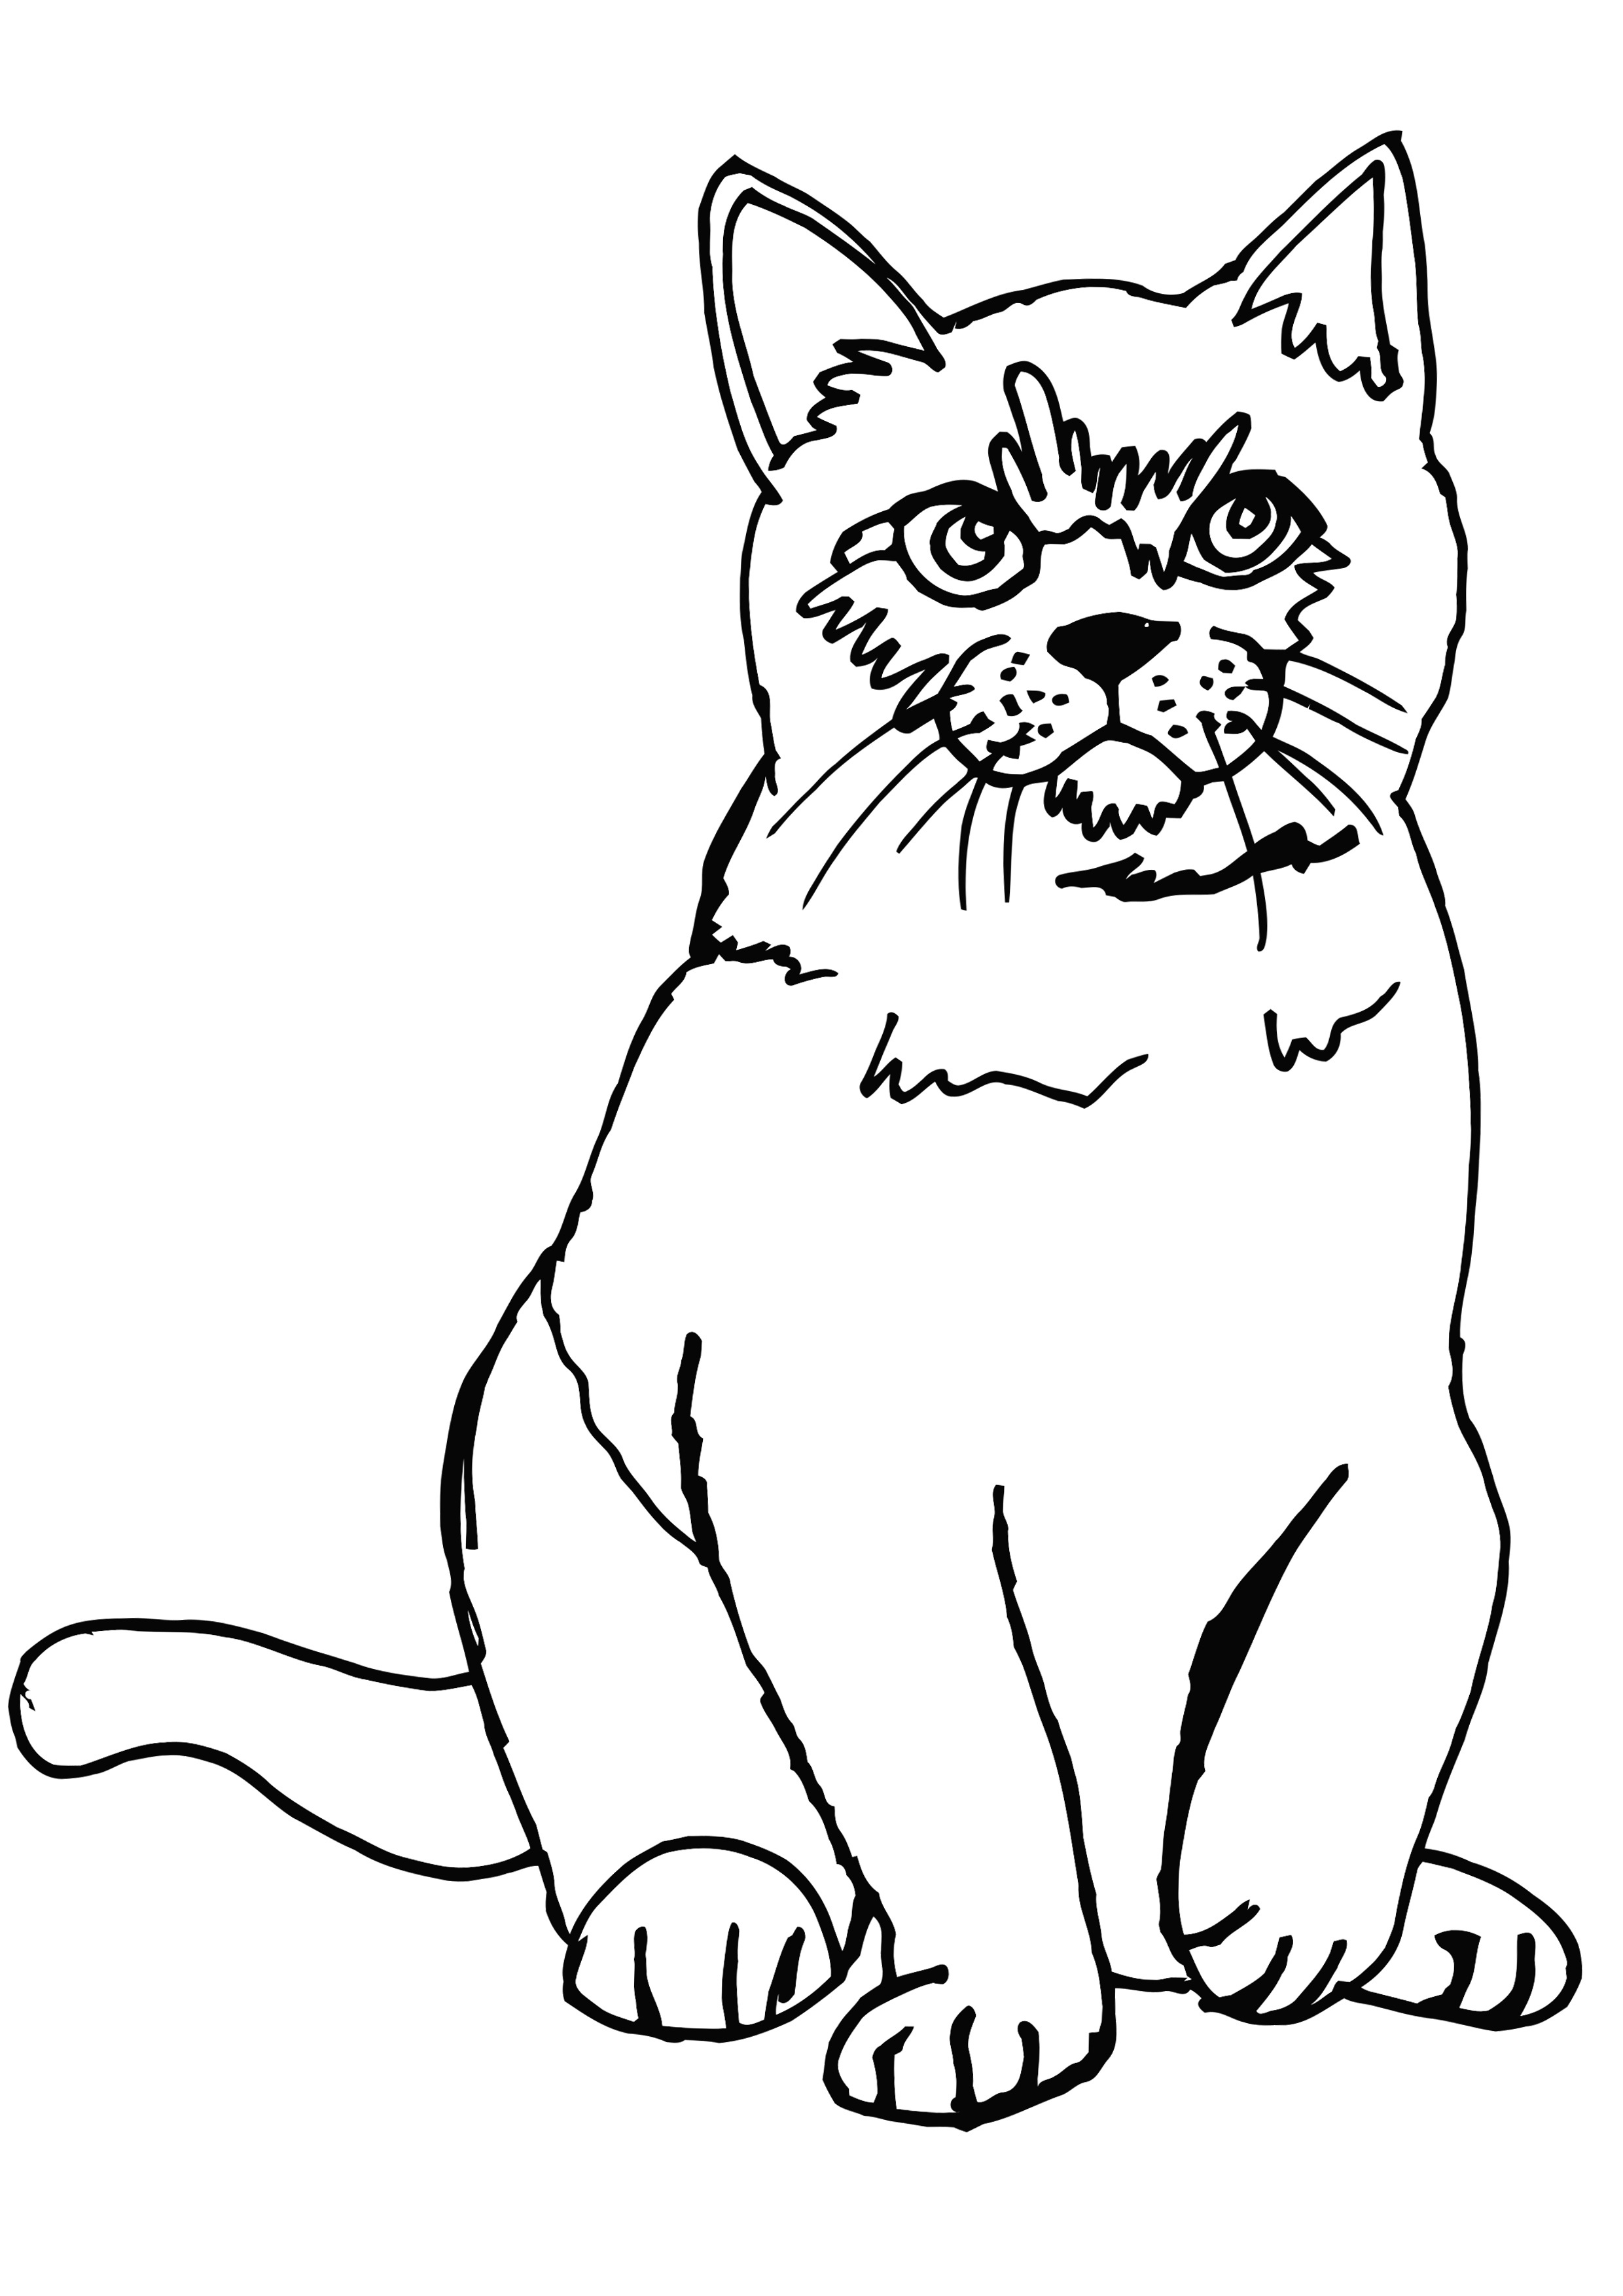 Kot Perski Kolorowanka Do Druku